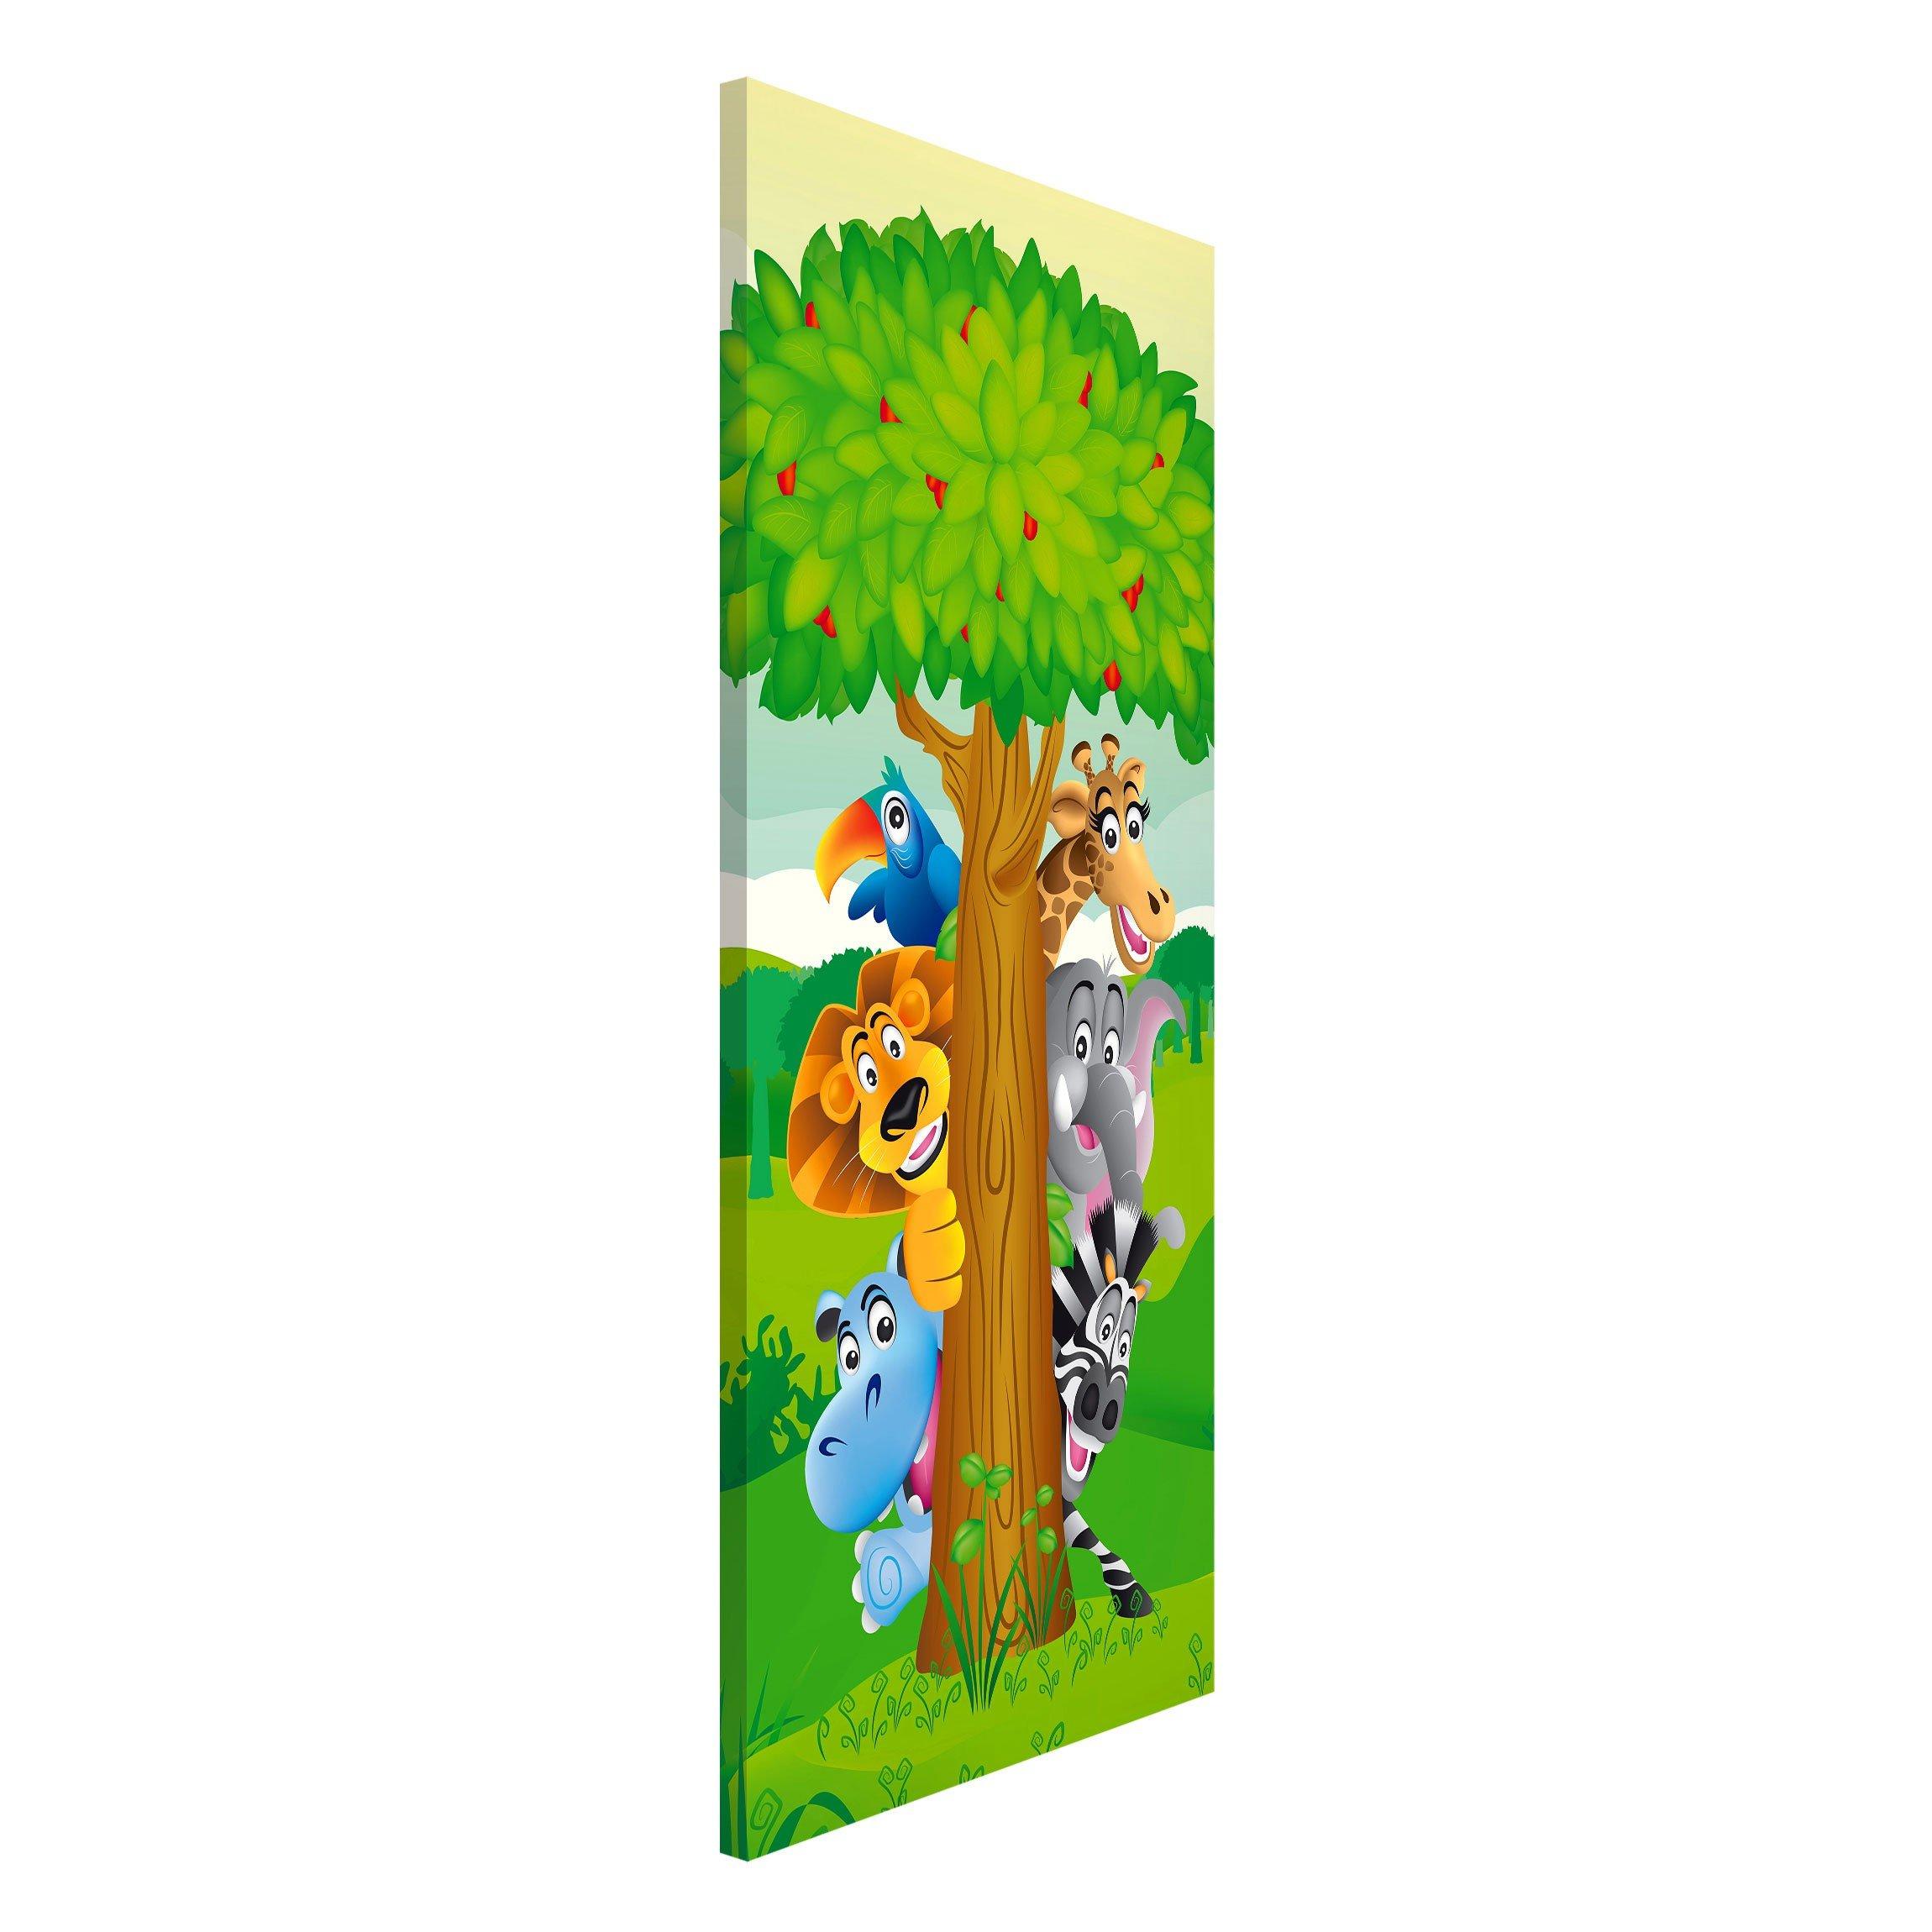 apalis 108649Magnet Board No. Bf1Jungle Animals Design High Metal Magnet Board Wall Steel Kitchen Office Memo Board 78x 37cm